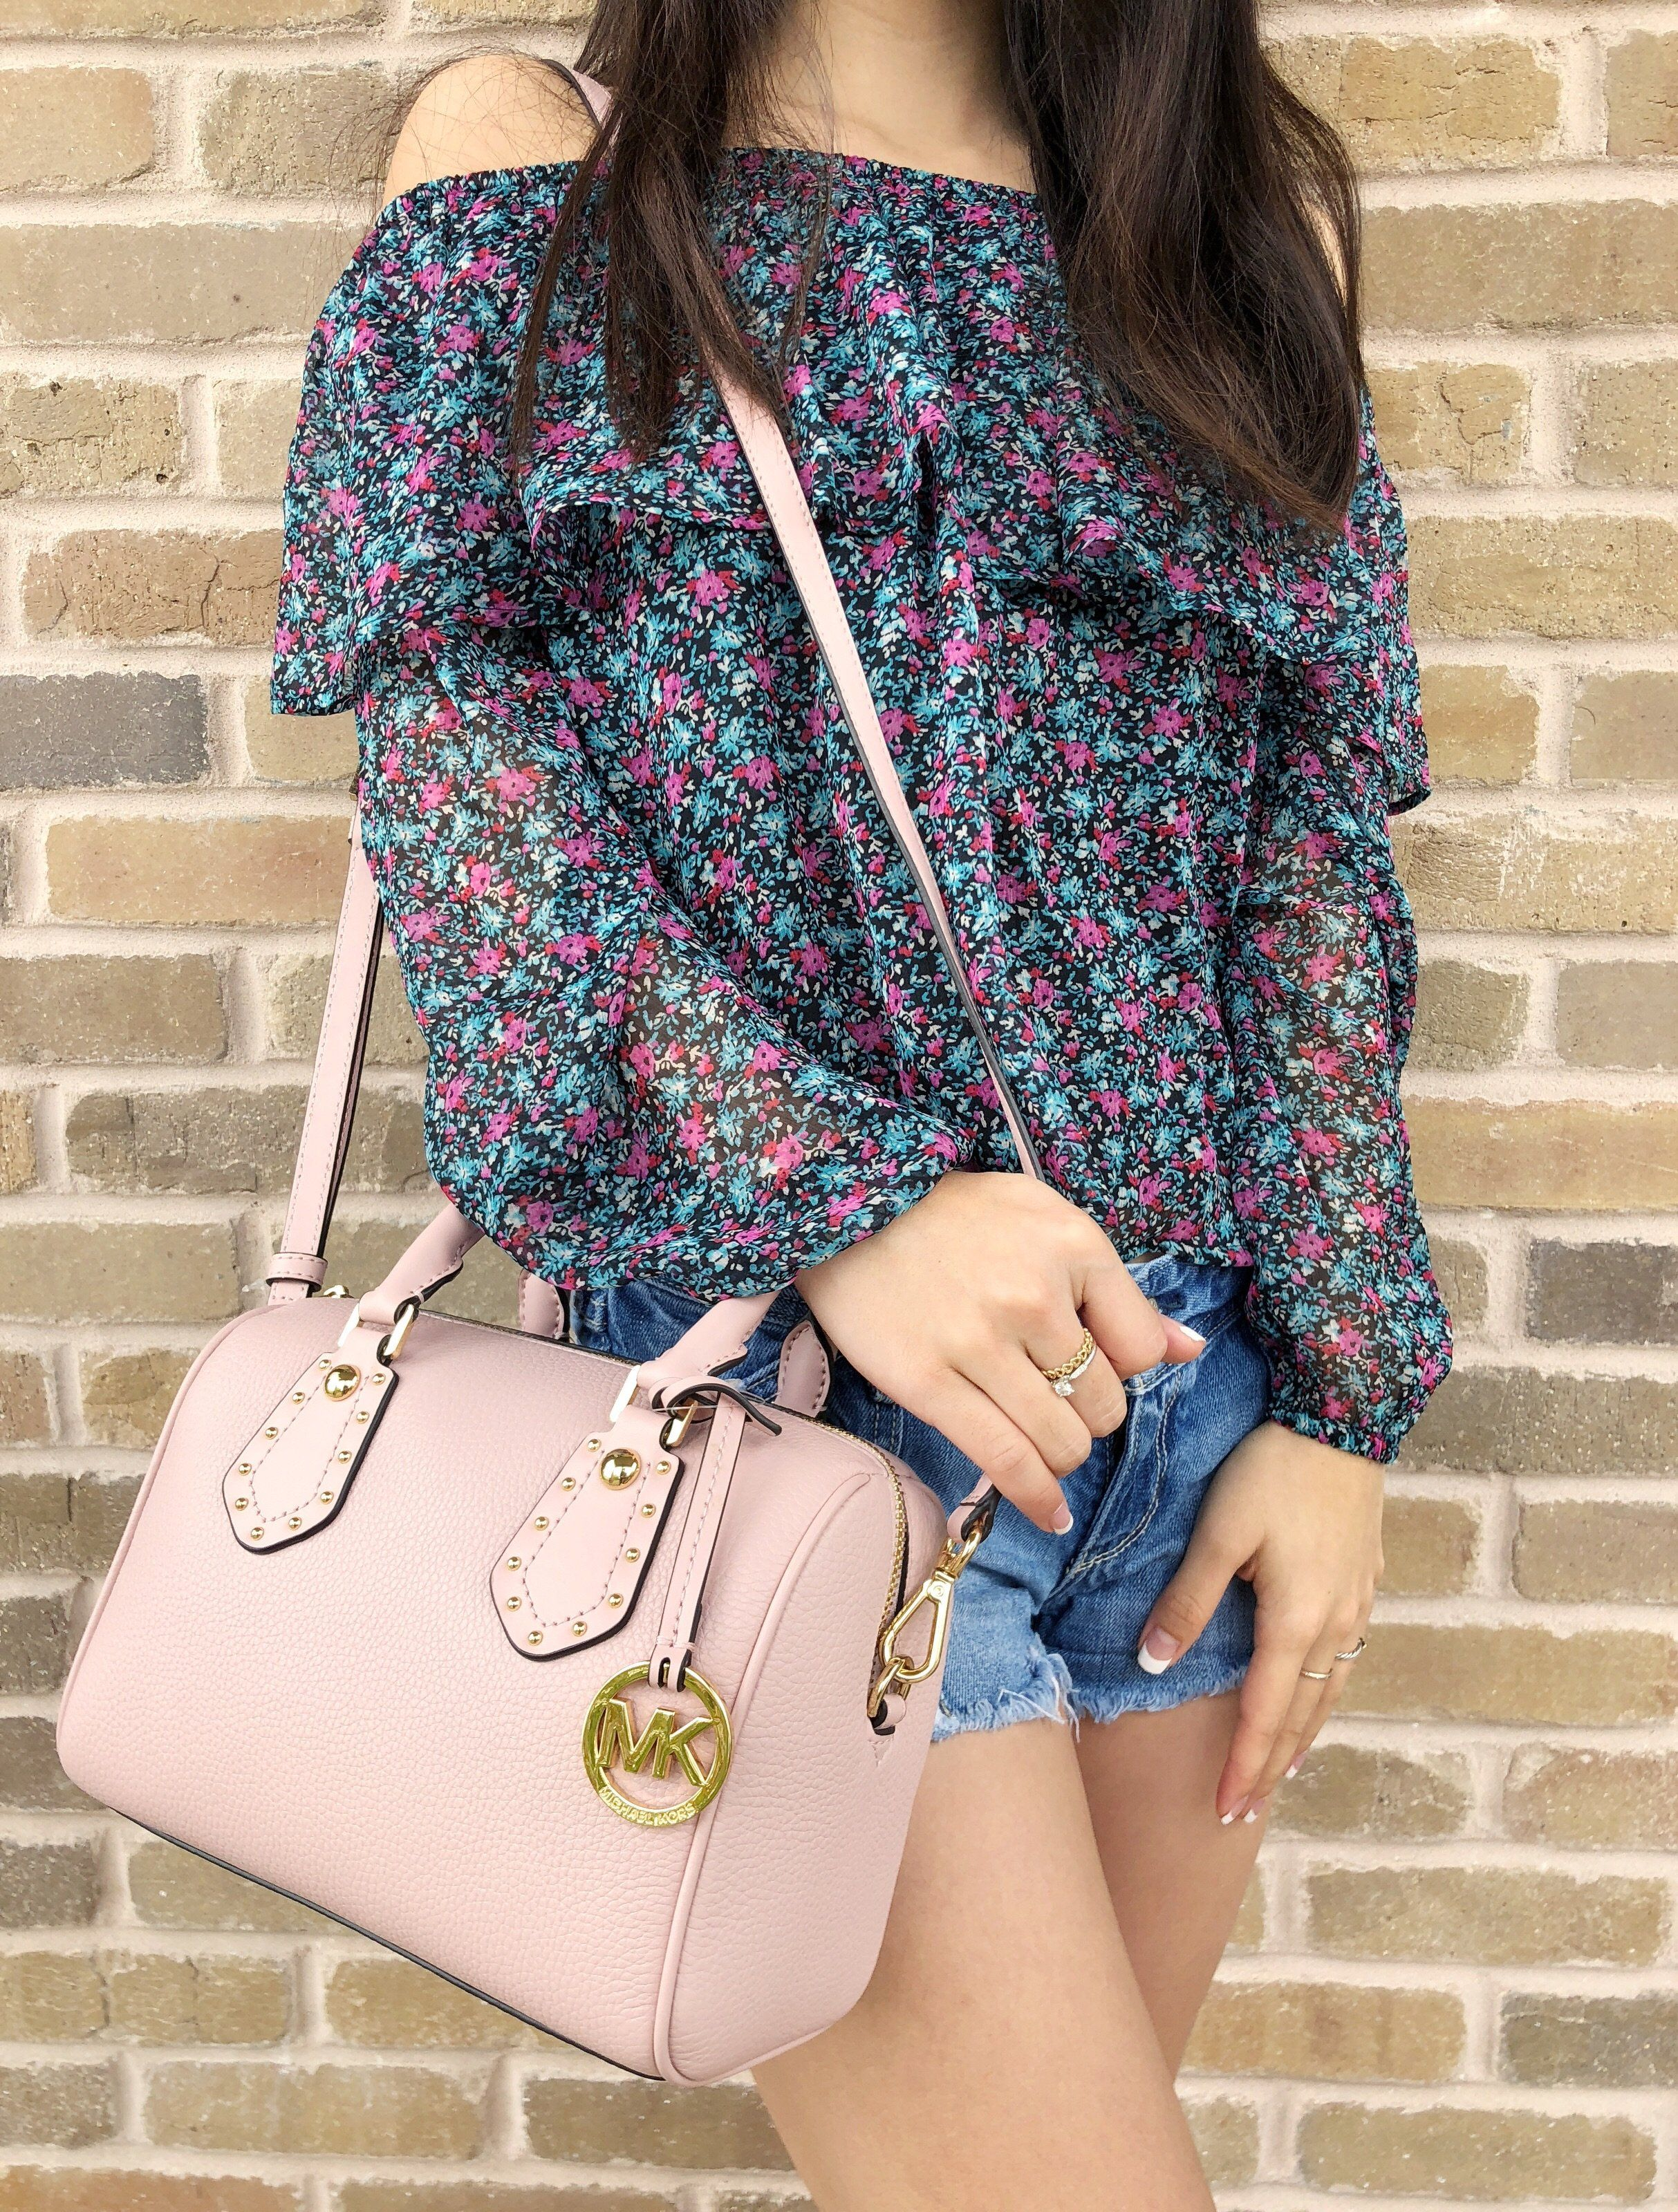 7ec023af471a Michael Kors Aria Small Top Zip Satchel Crossbody Blossom Pink Pebble  Grayson #amazondeals #ebaybusiness #amazonfashion #ebaystore #Handbags #top  #amazon ...